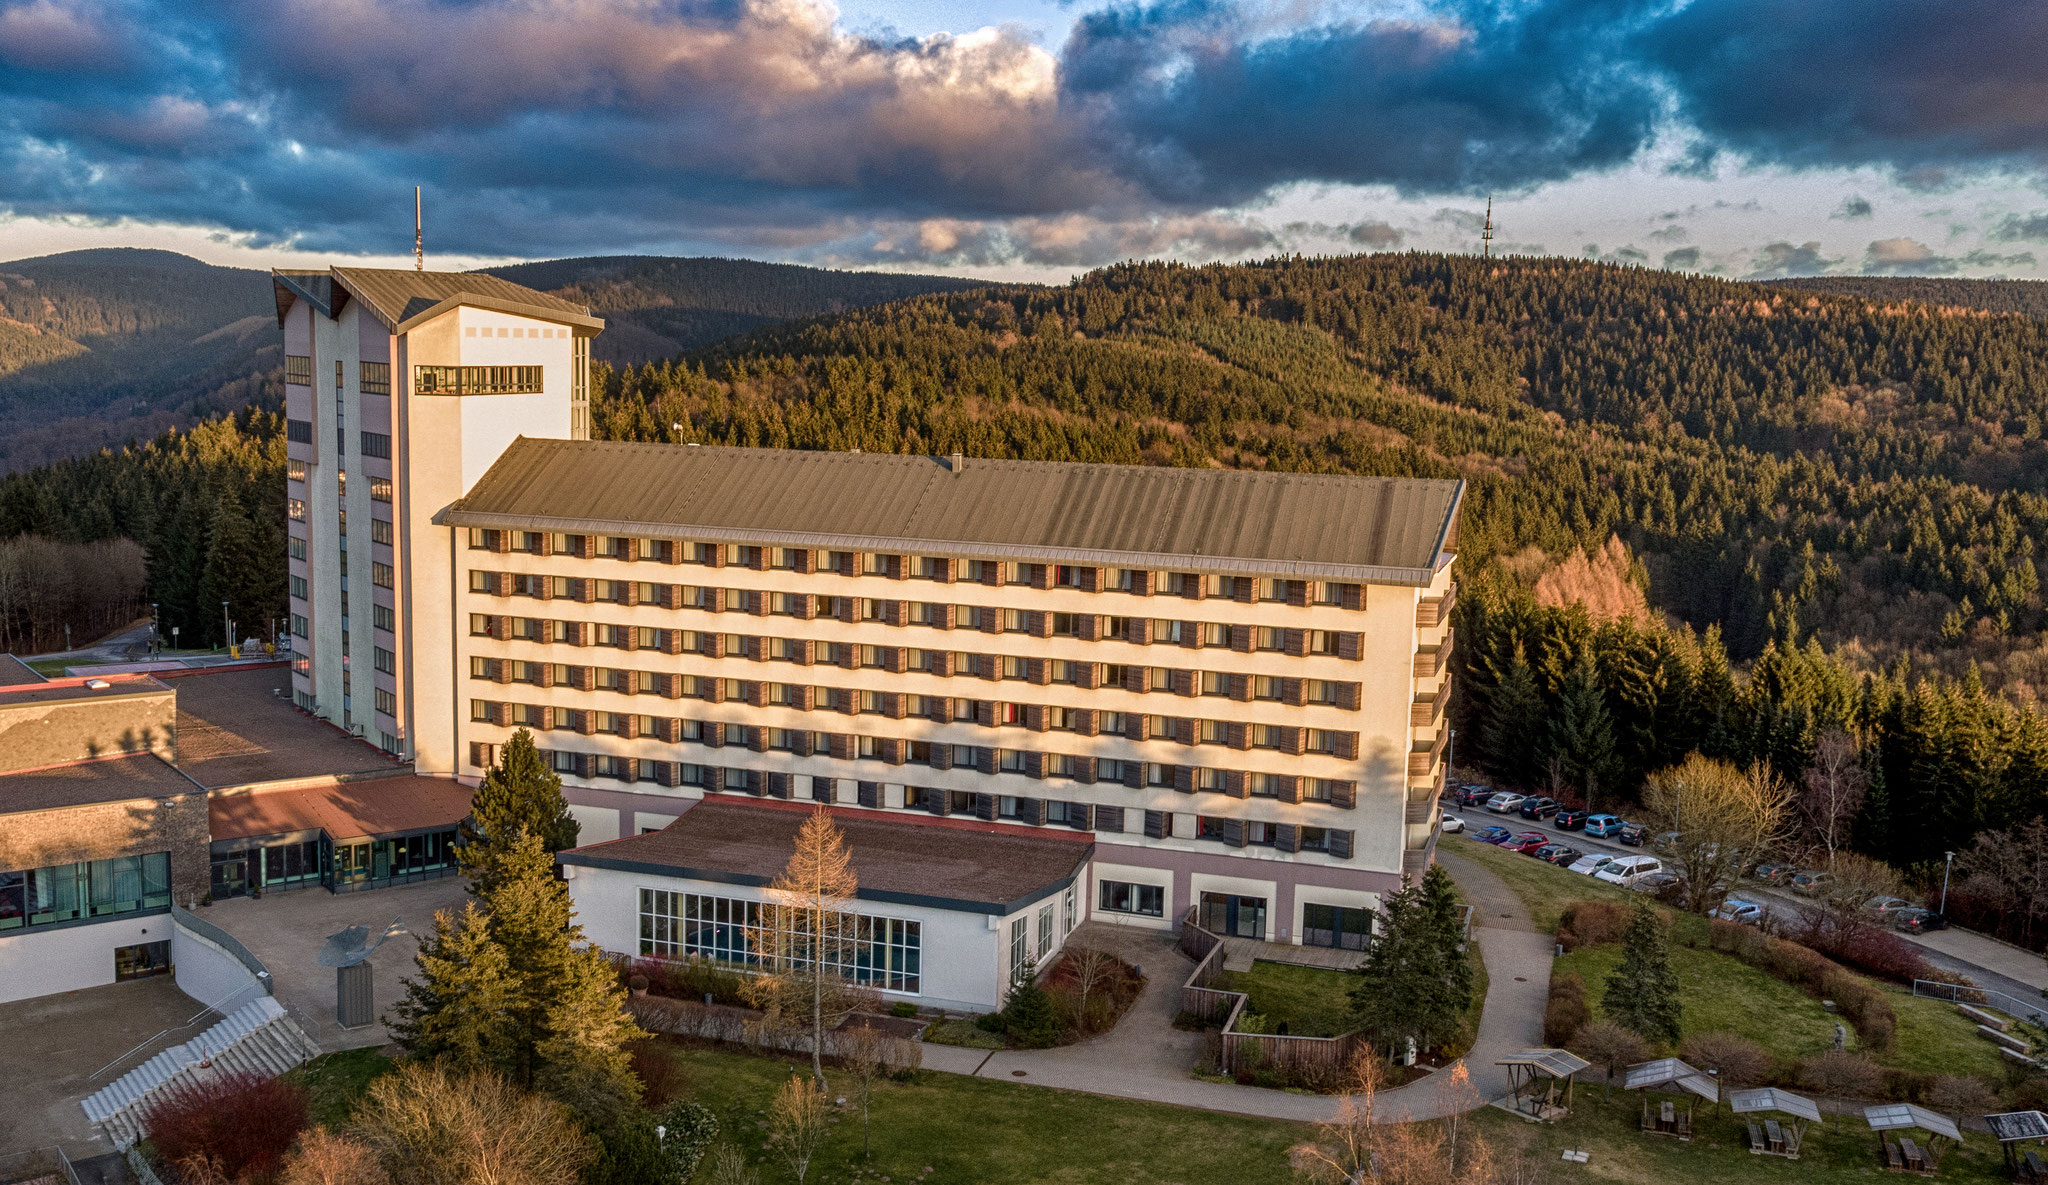 Ringberg Hotel Suhl